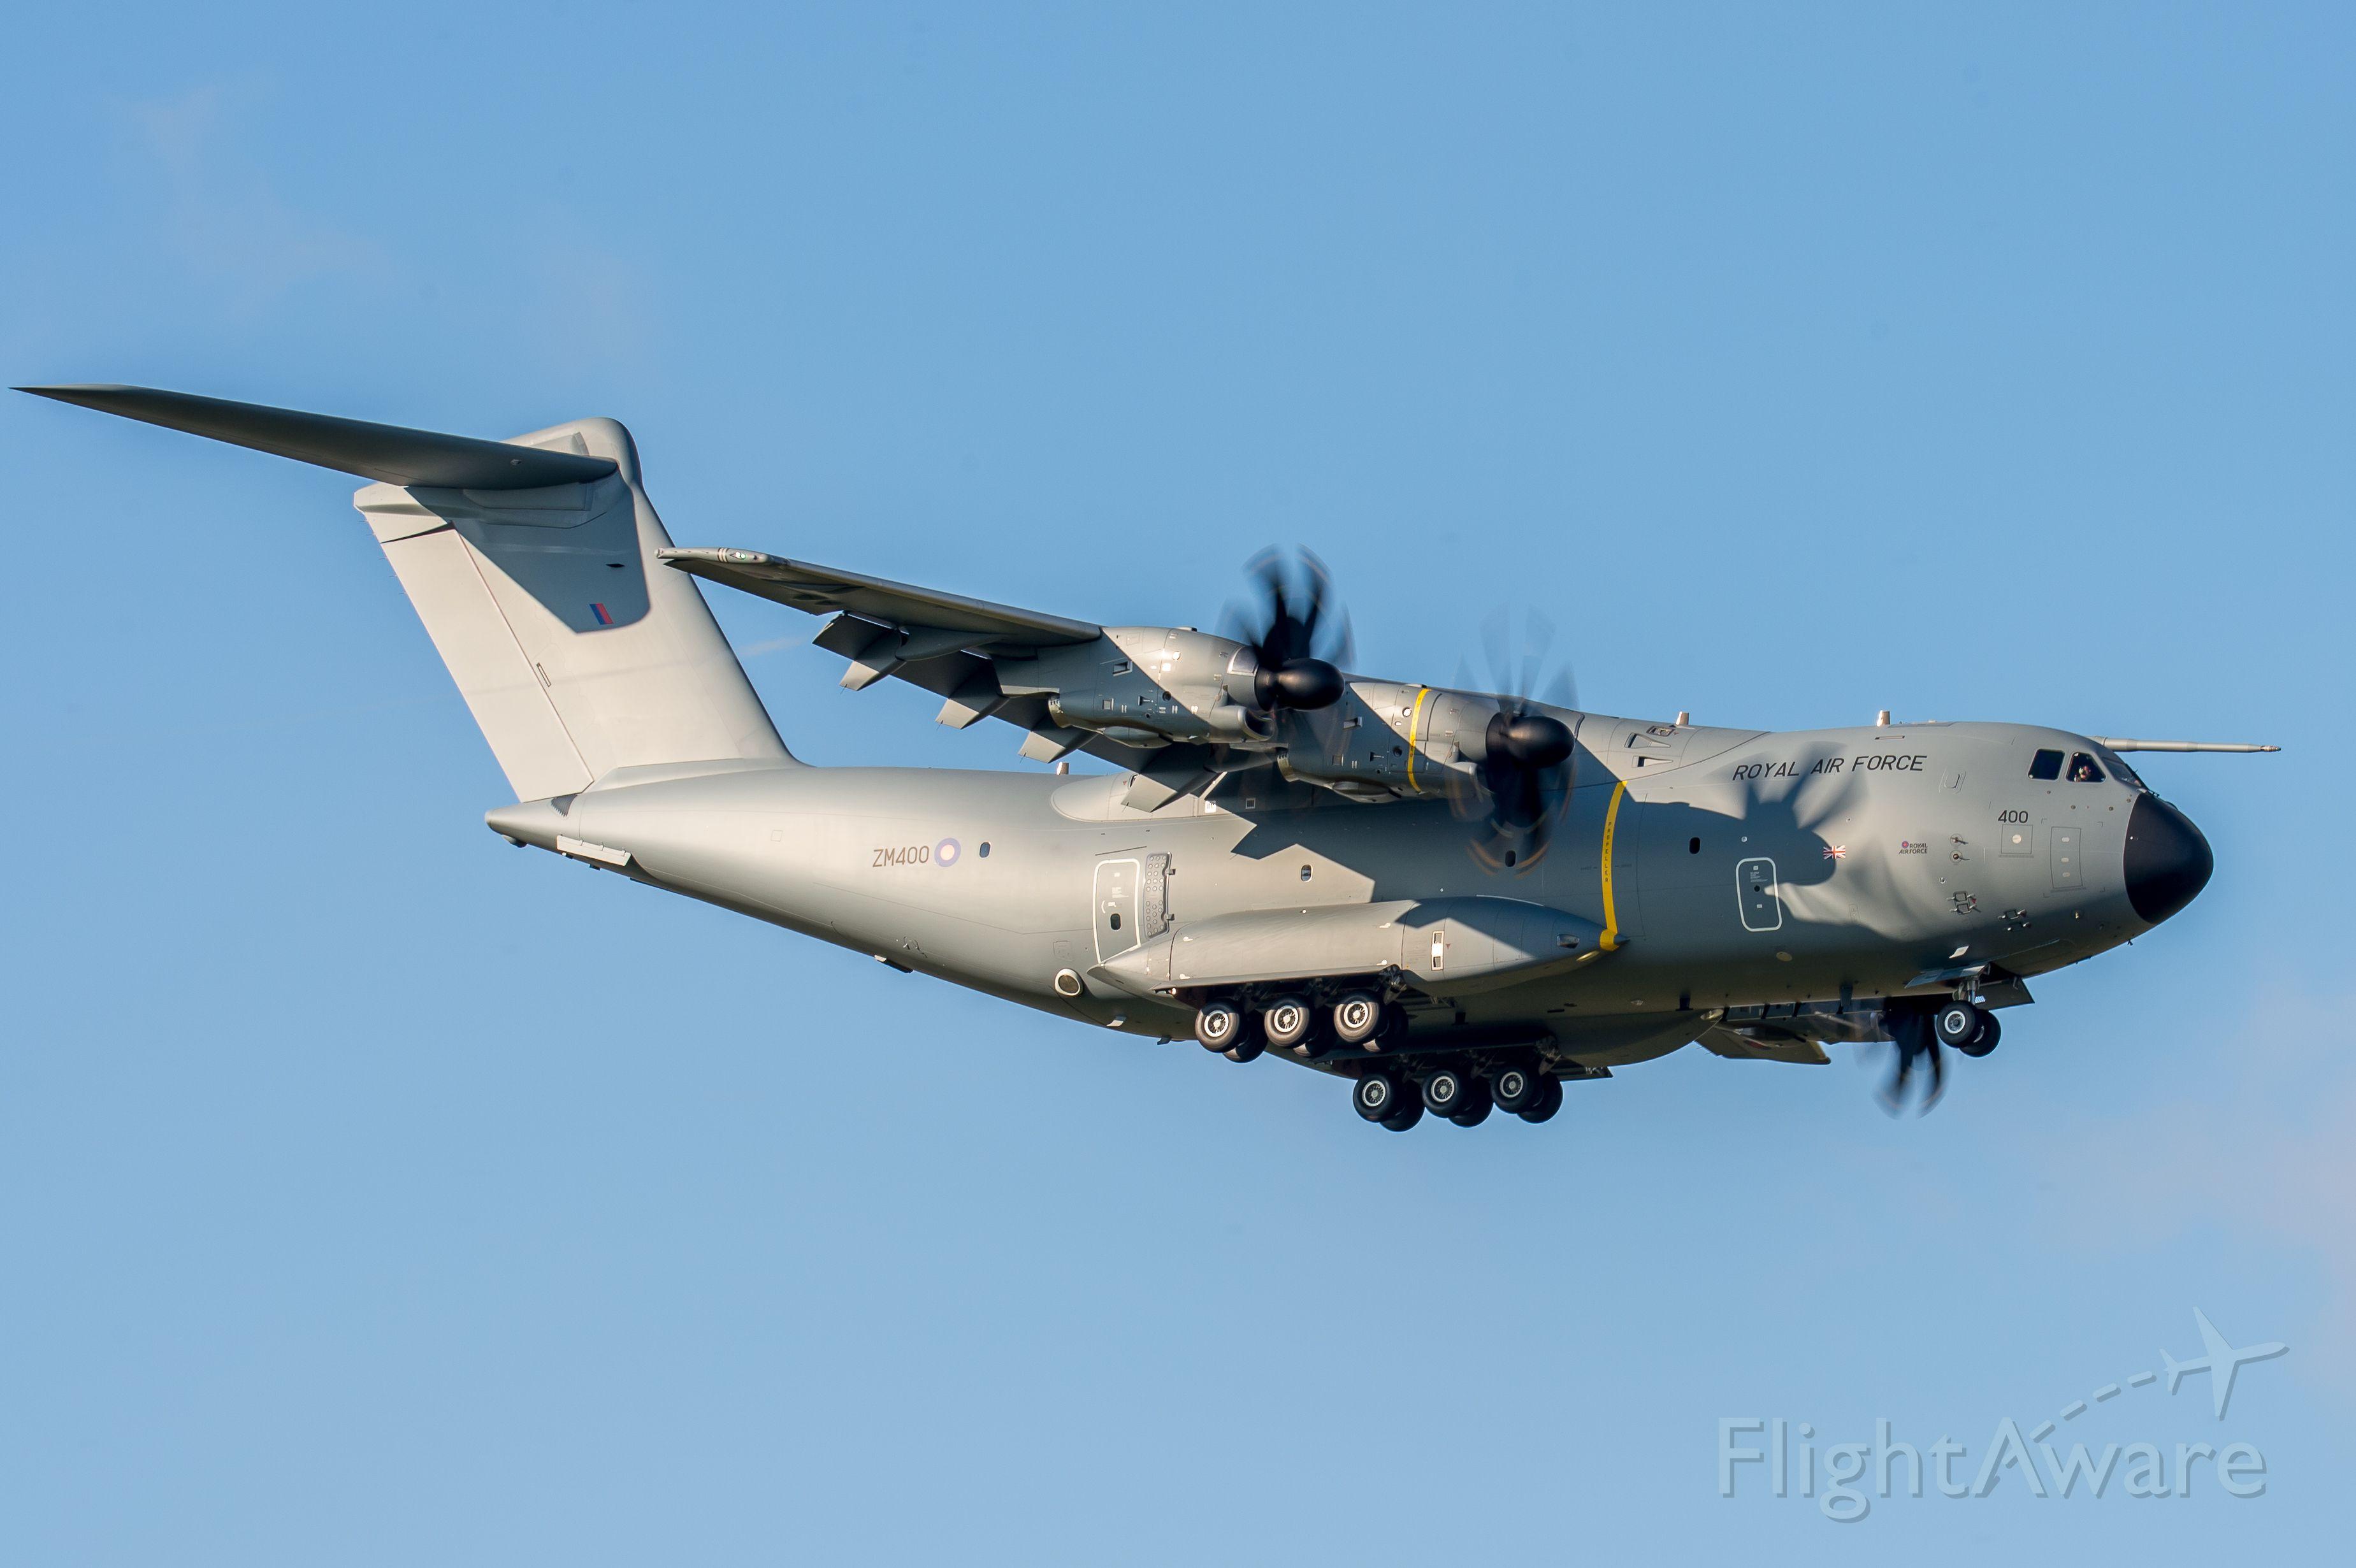 AIRBUS A-400M Atlas (ZM400)